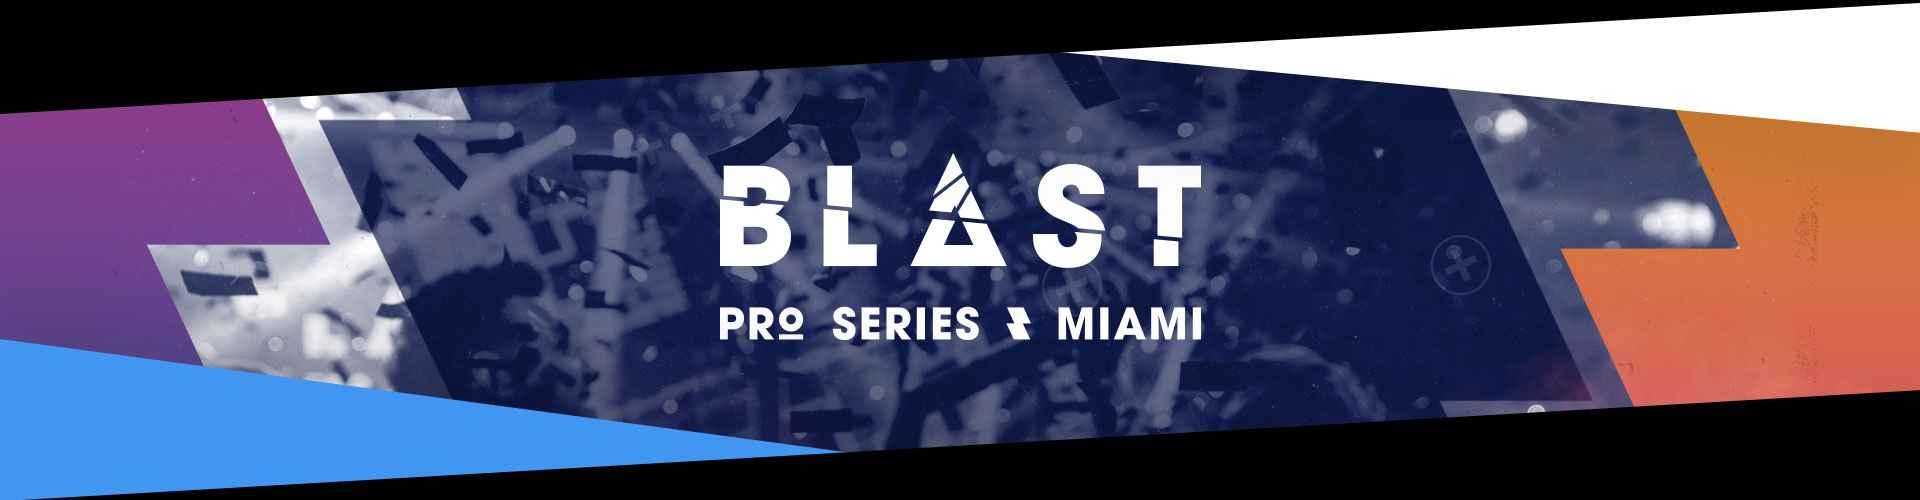 Counter-Strike: Global Offensive - BLAST Pro Series Miami